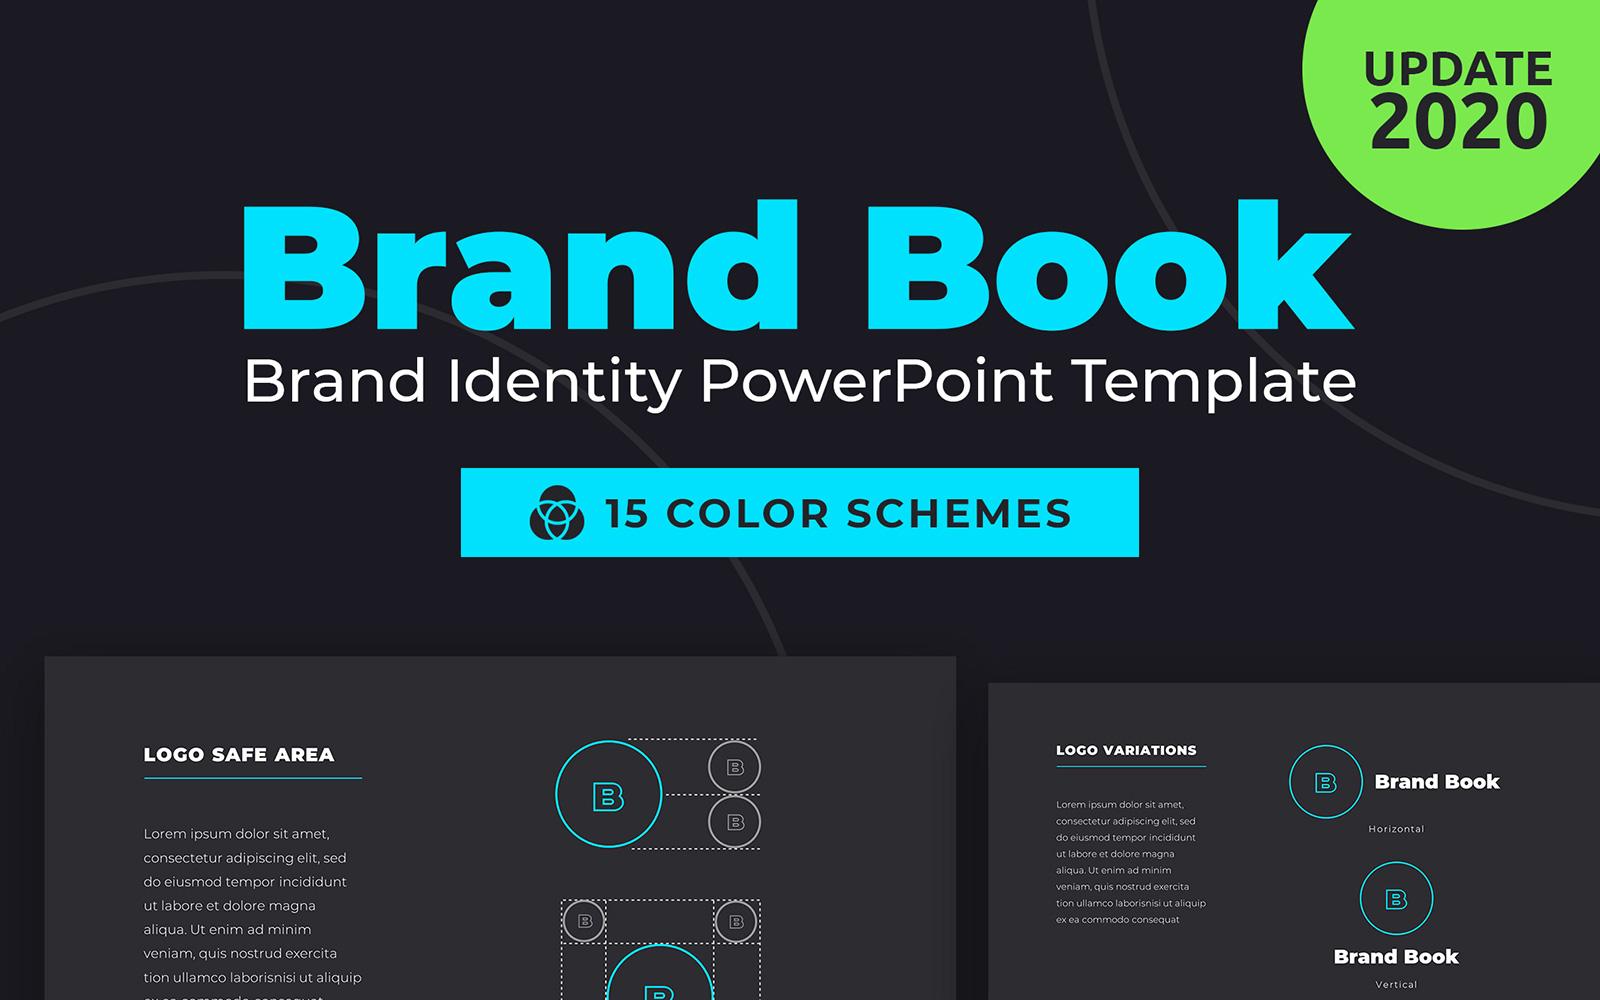 BrandBook Brand Identity PowerPoint Template